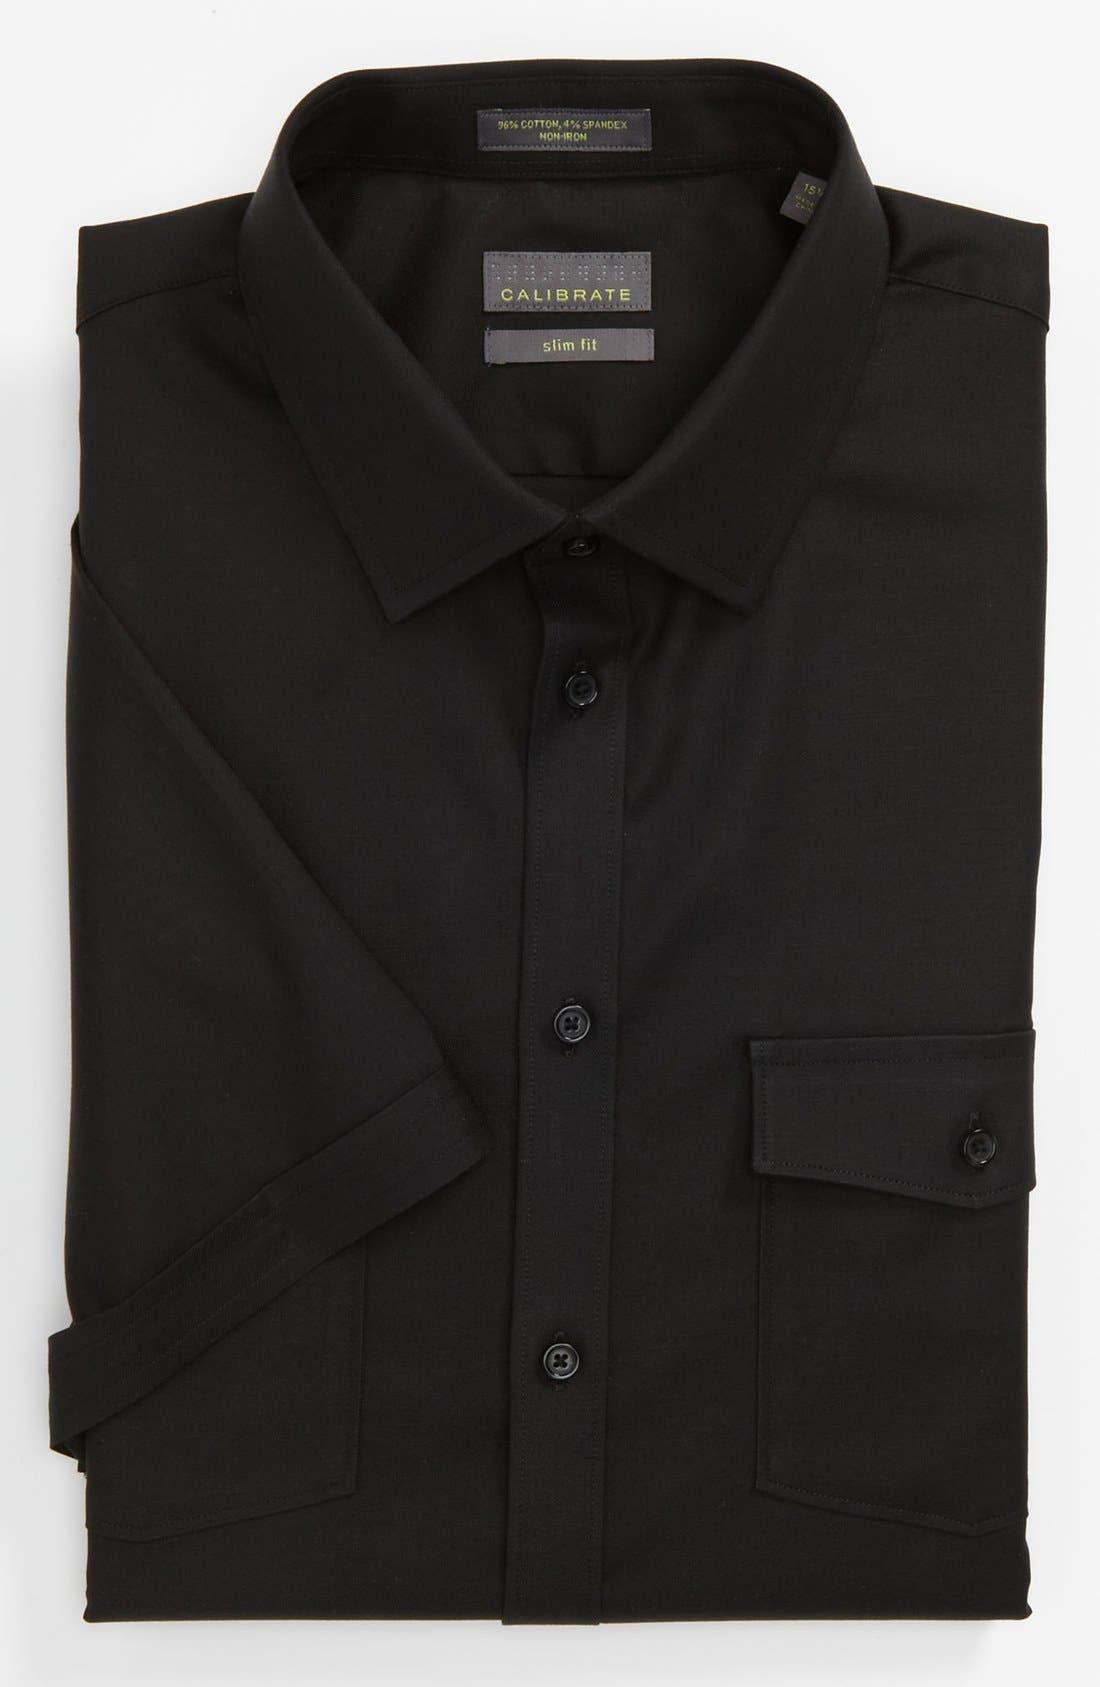 Main Image - Calibrate Slim Fit Non-Iron Short Sleeve Shirt